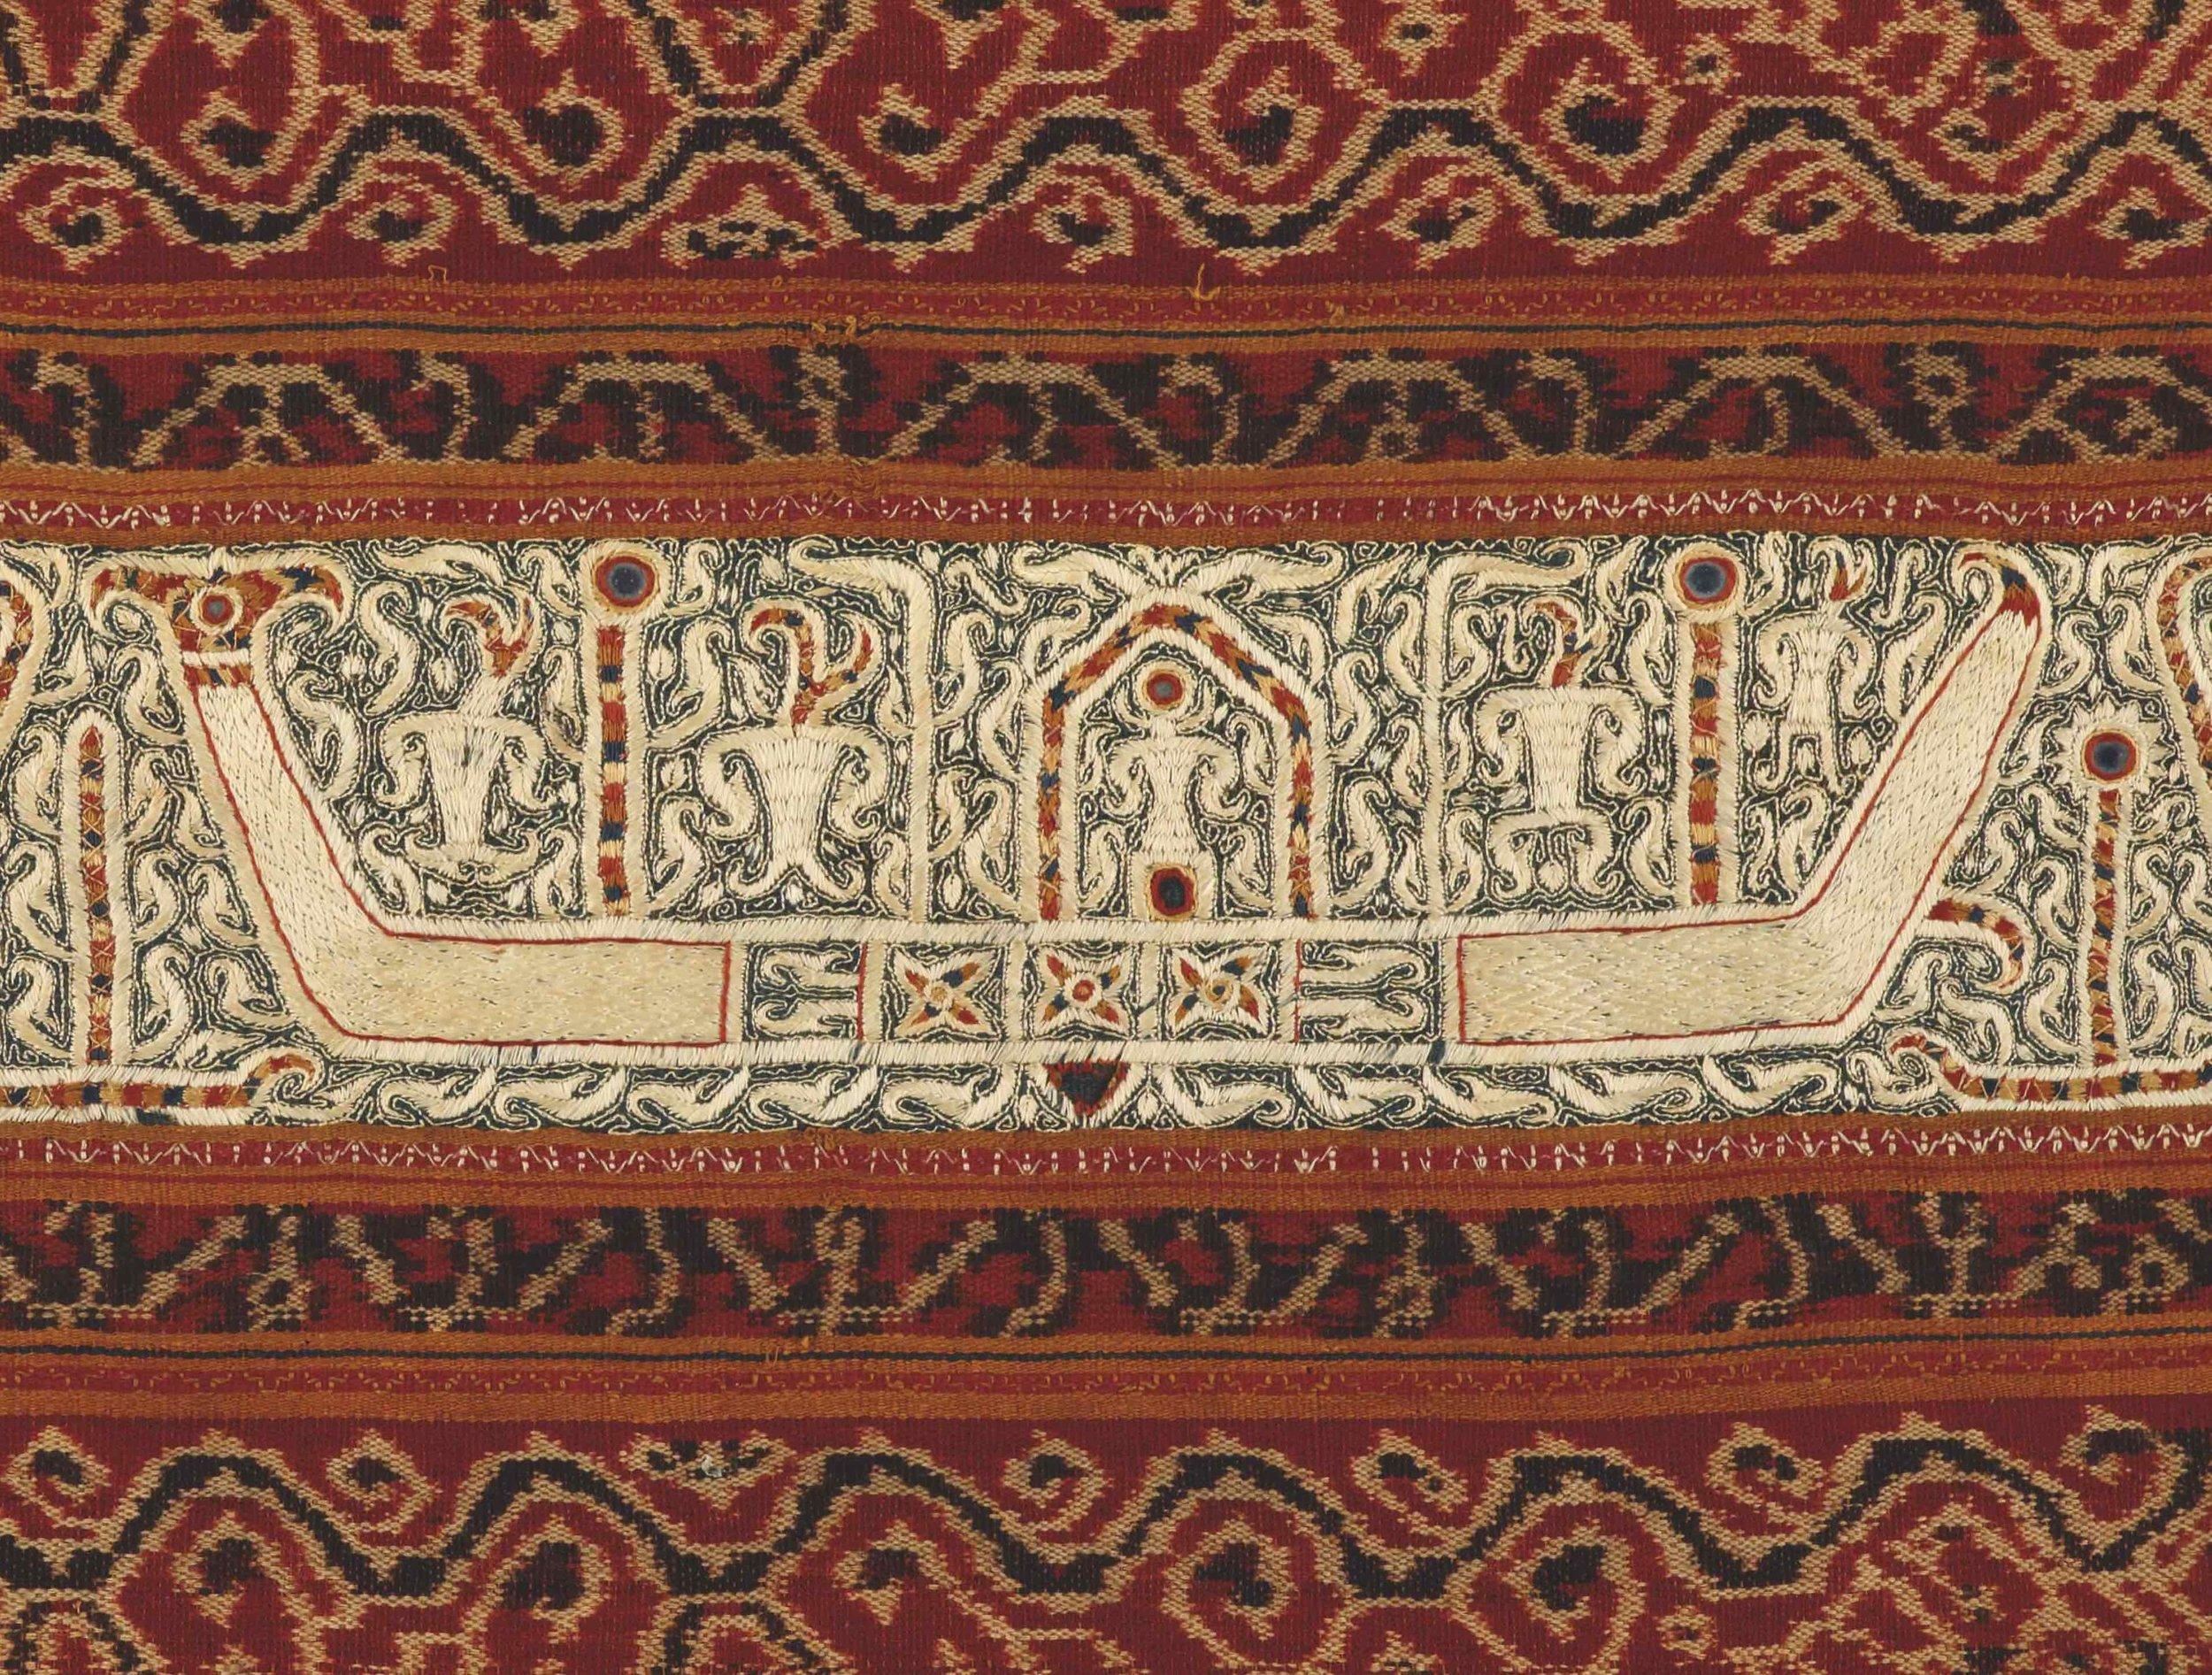 Detail of Woman's Ceremonial Skirt |  Tapis  © Dallas Museum of Art | Texas, USA